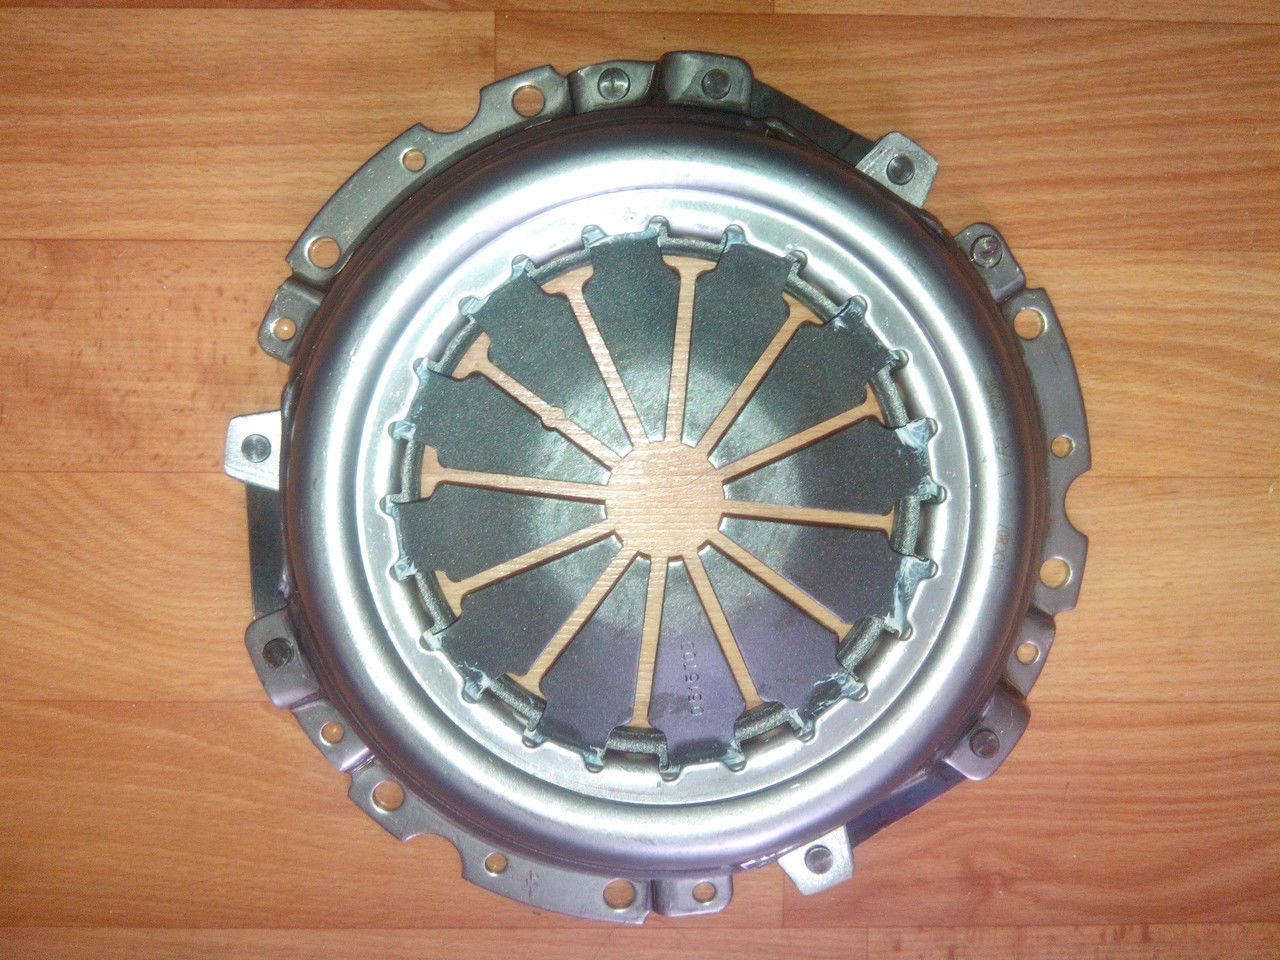 Диск сцепл. нажимной ВАЗ 2112 (8-ми+16-ти клап. двиг.) (пр-во ВИС)